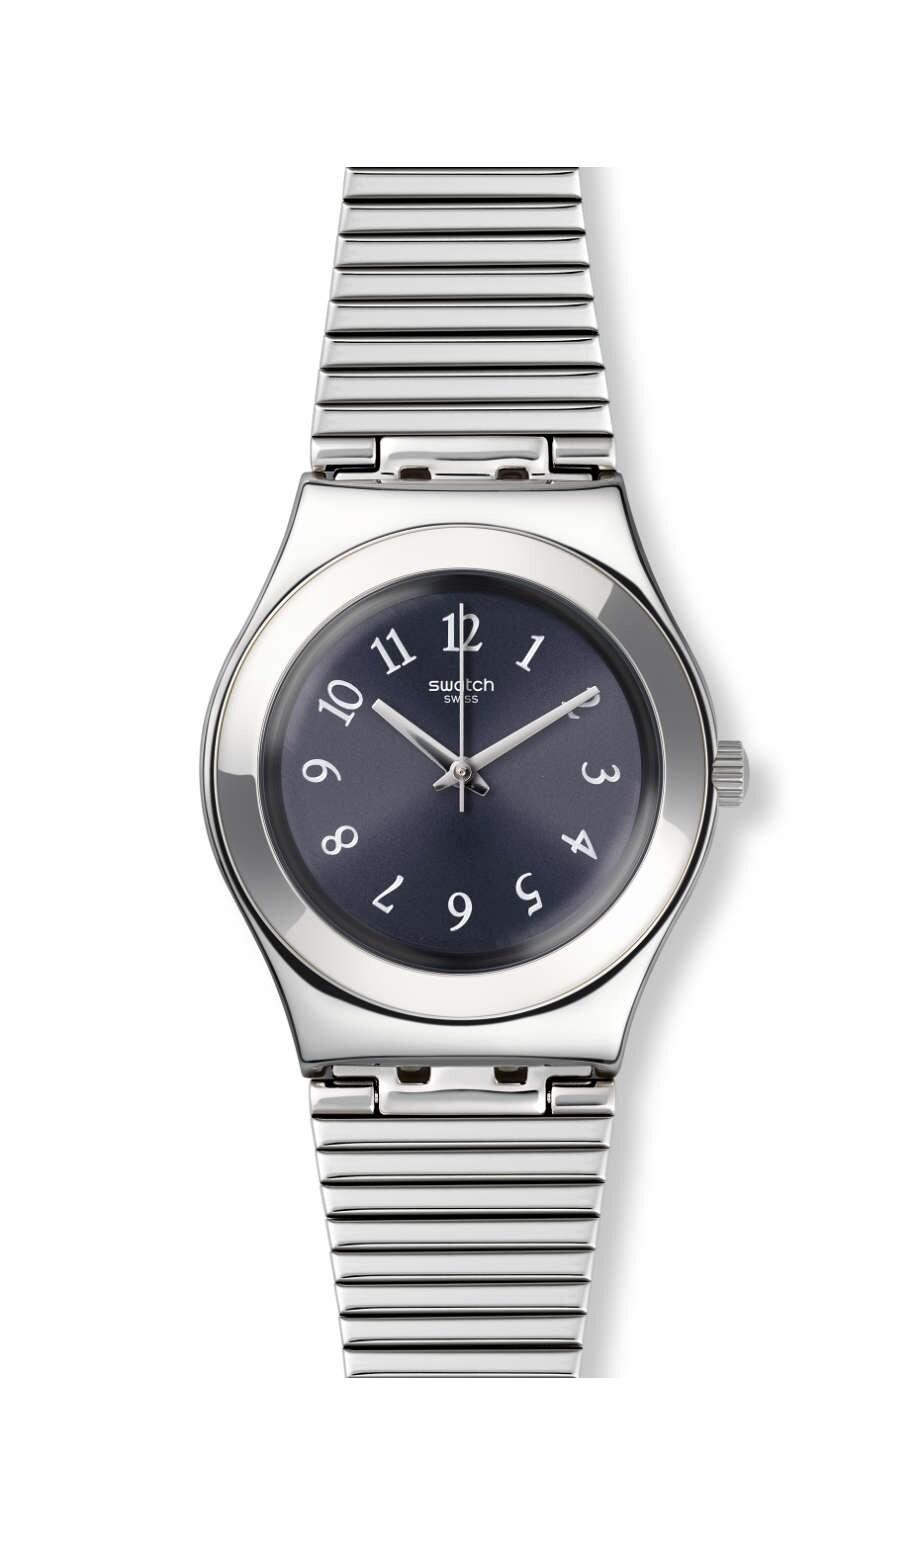 Swatch - STARLING - 1